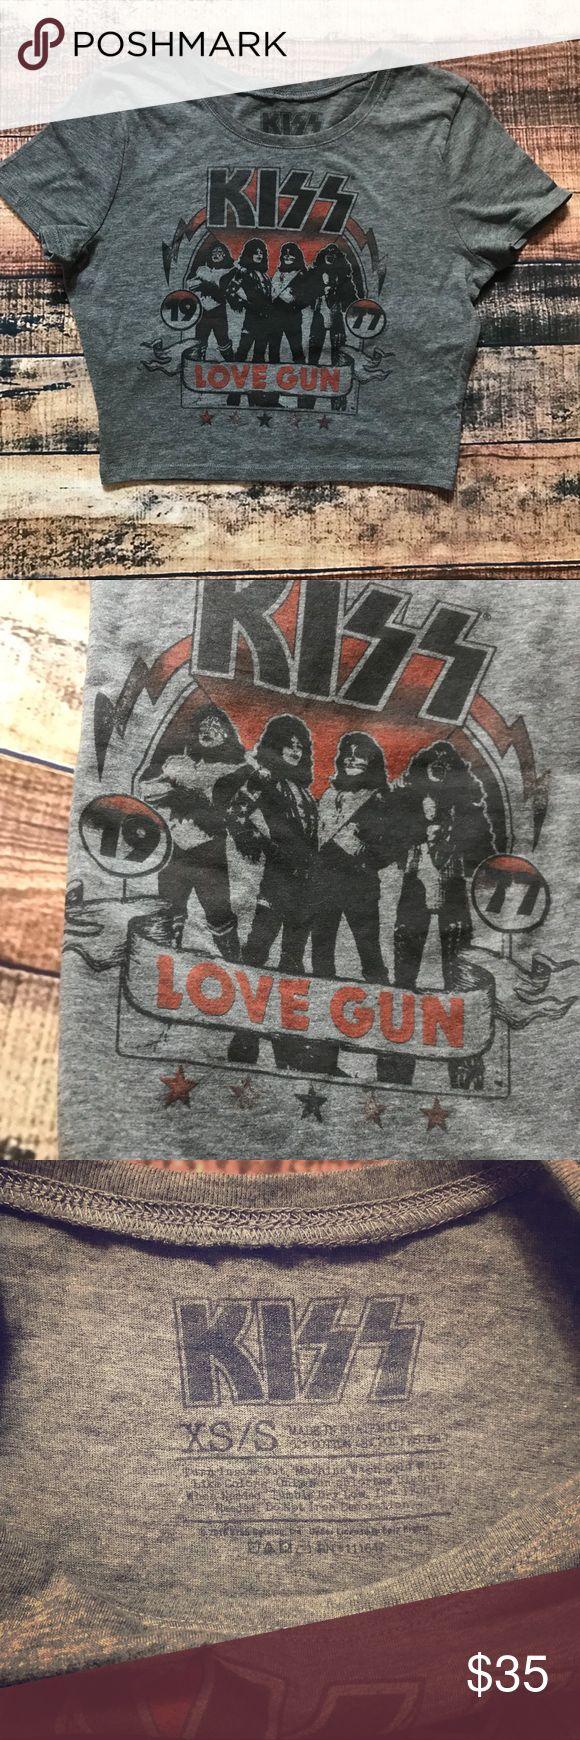 "Kiss crop top love gun 1977 xs/s Kiss xs/small crop top love gun 1977  from authentic kiss merchandise 100% cotton made in Guatemala  2016 catalog  measurements are :  Chest : 16"" Length: 16"" #kiss #kisstshirt #kissband #kissfan #kisslove #kisslovegun #kiss1977 Kiss Tops Crop Tops"